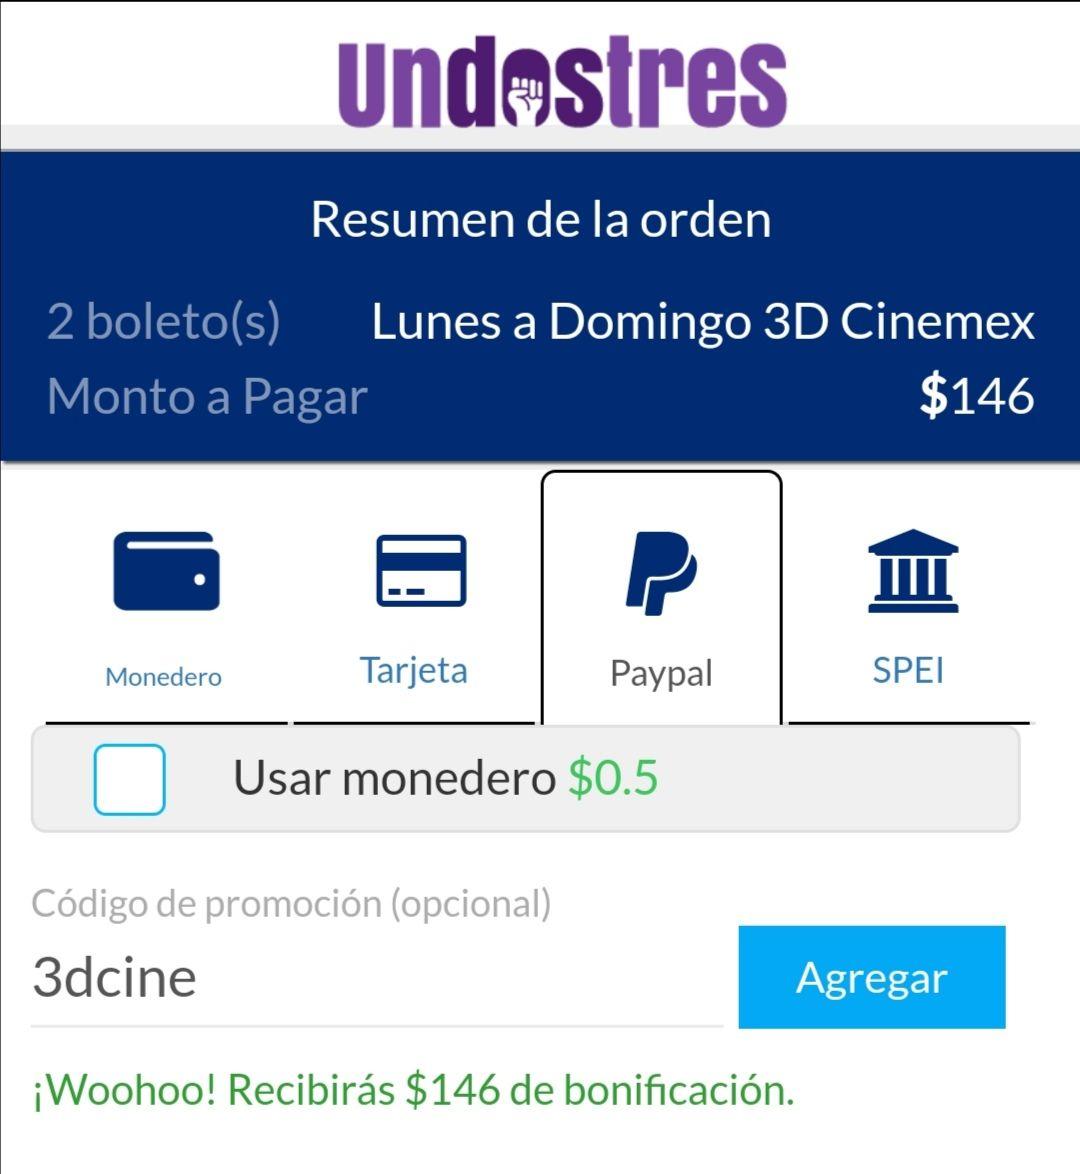 UnDosTres: 100% cashback en compra de boletos de cine